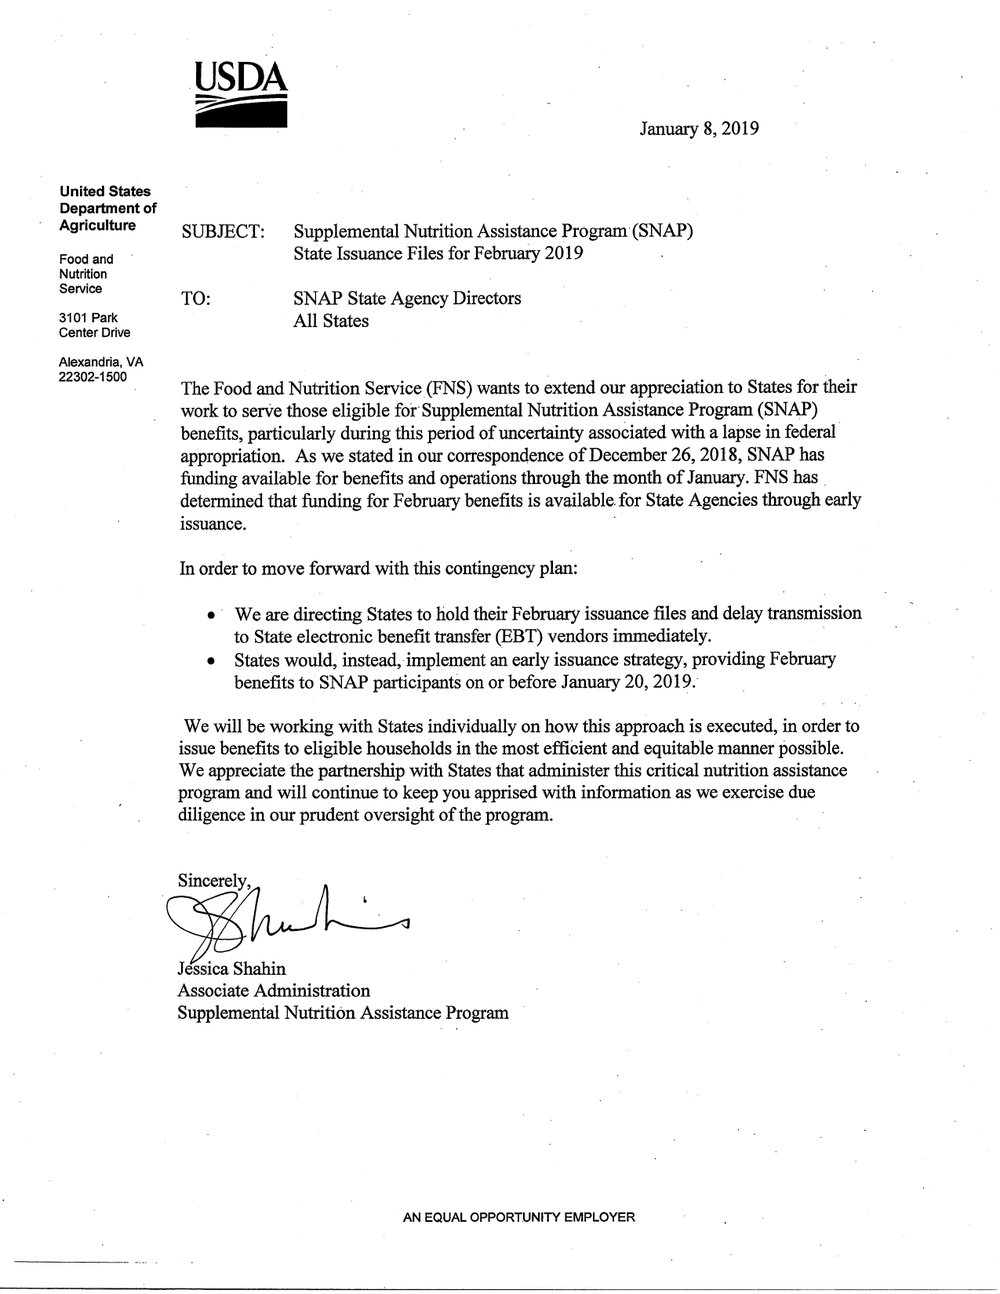 USDA SNAP Letter to States 010819.jpg